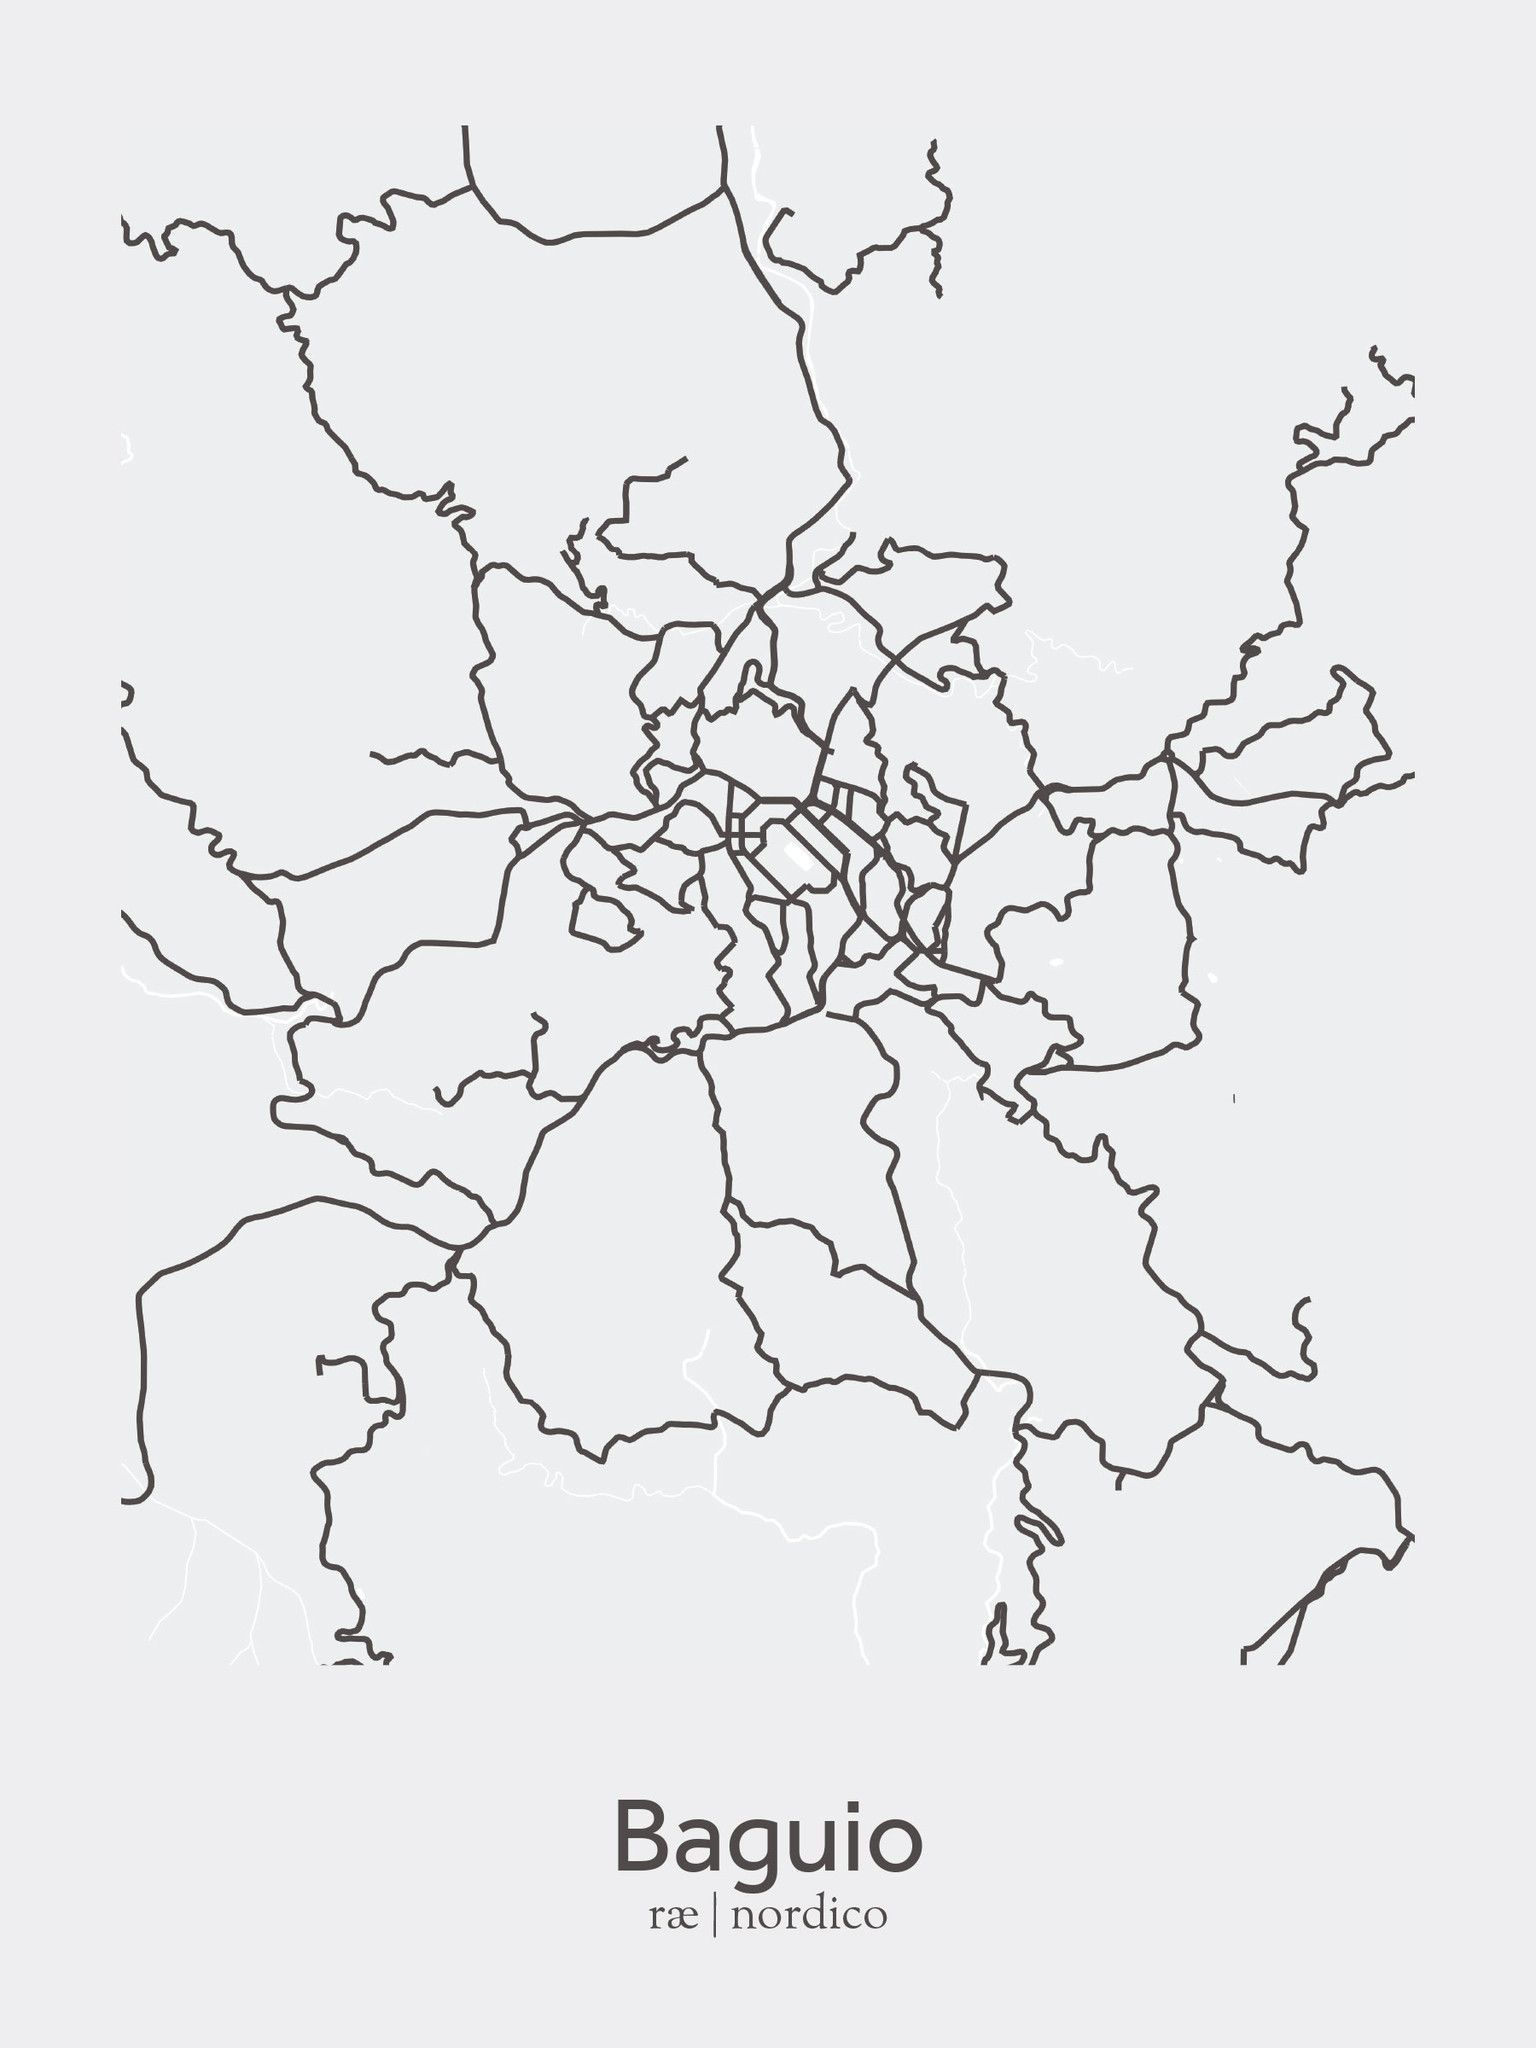 Baguio city philippines map print maps pinterest philippine baguio city philippines map print publicscrutiny Images